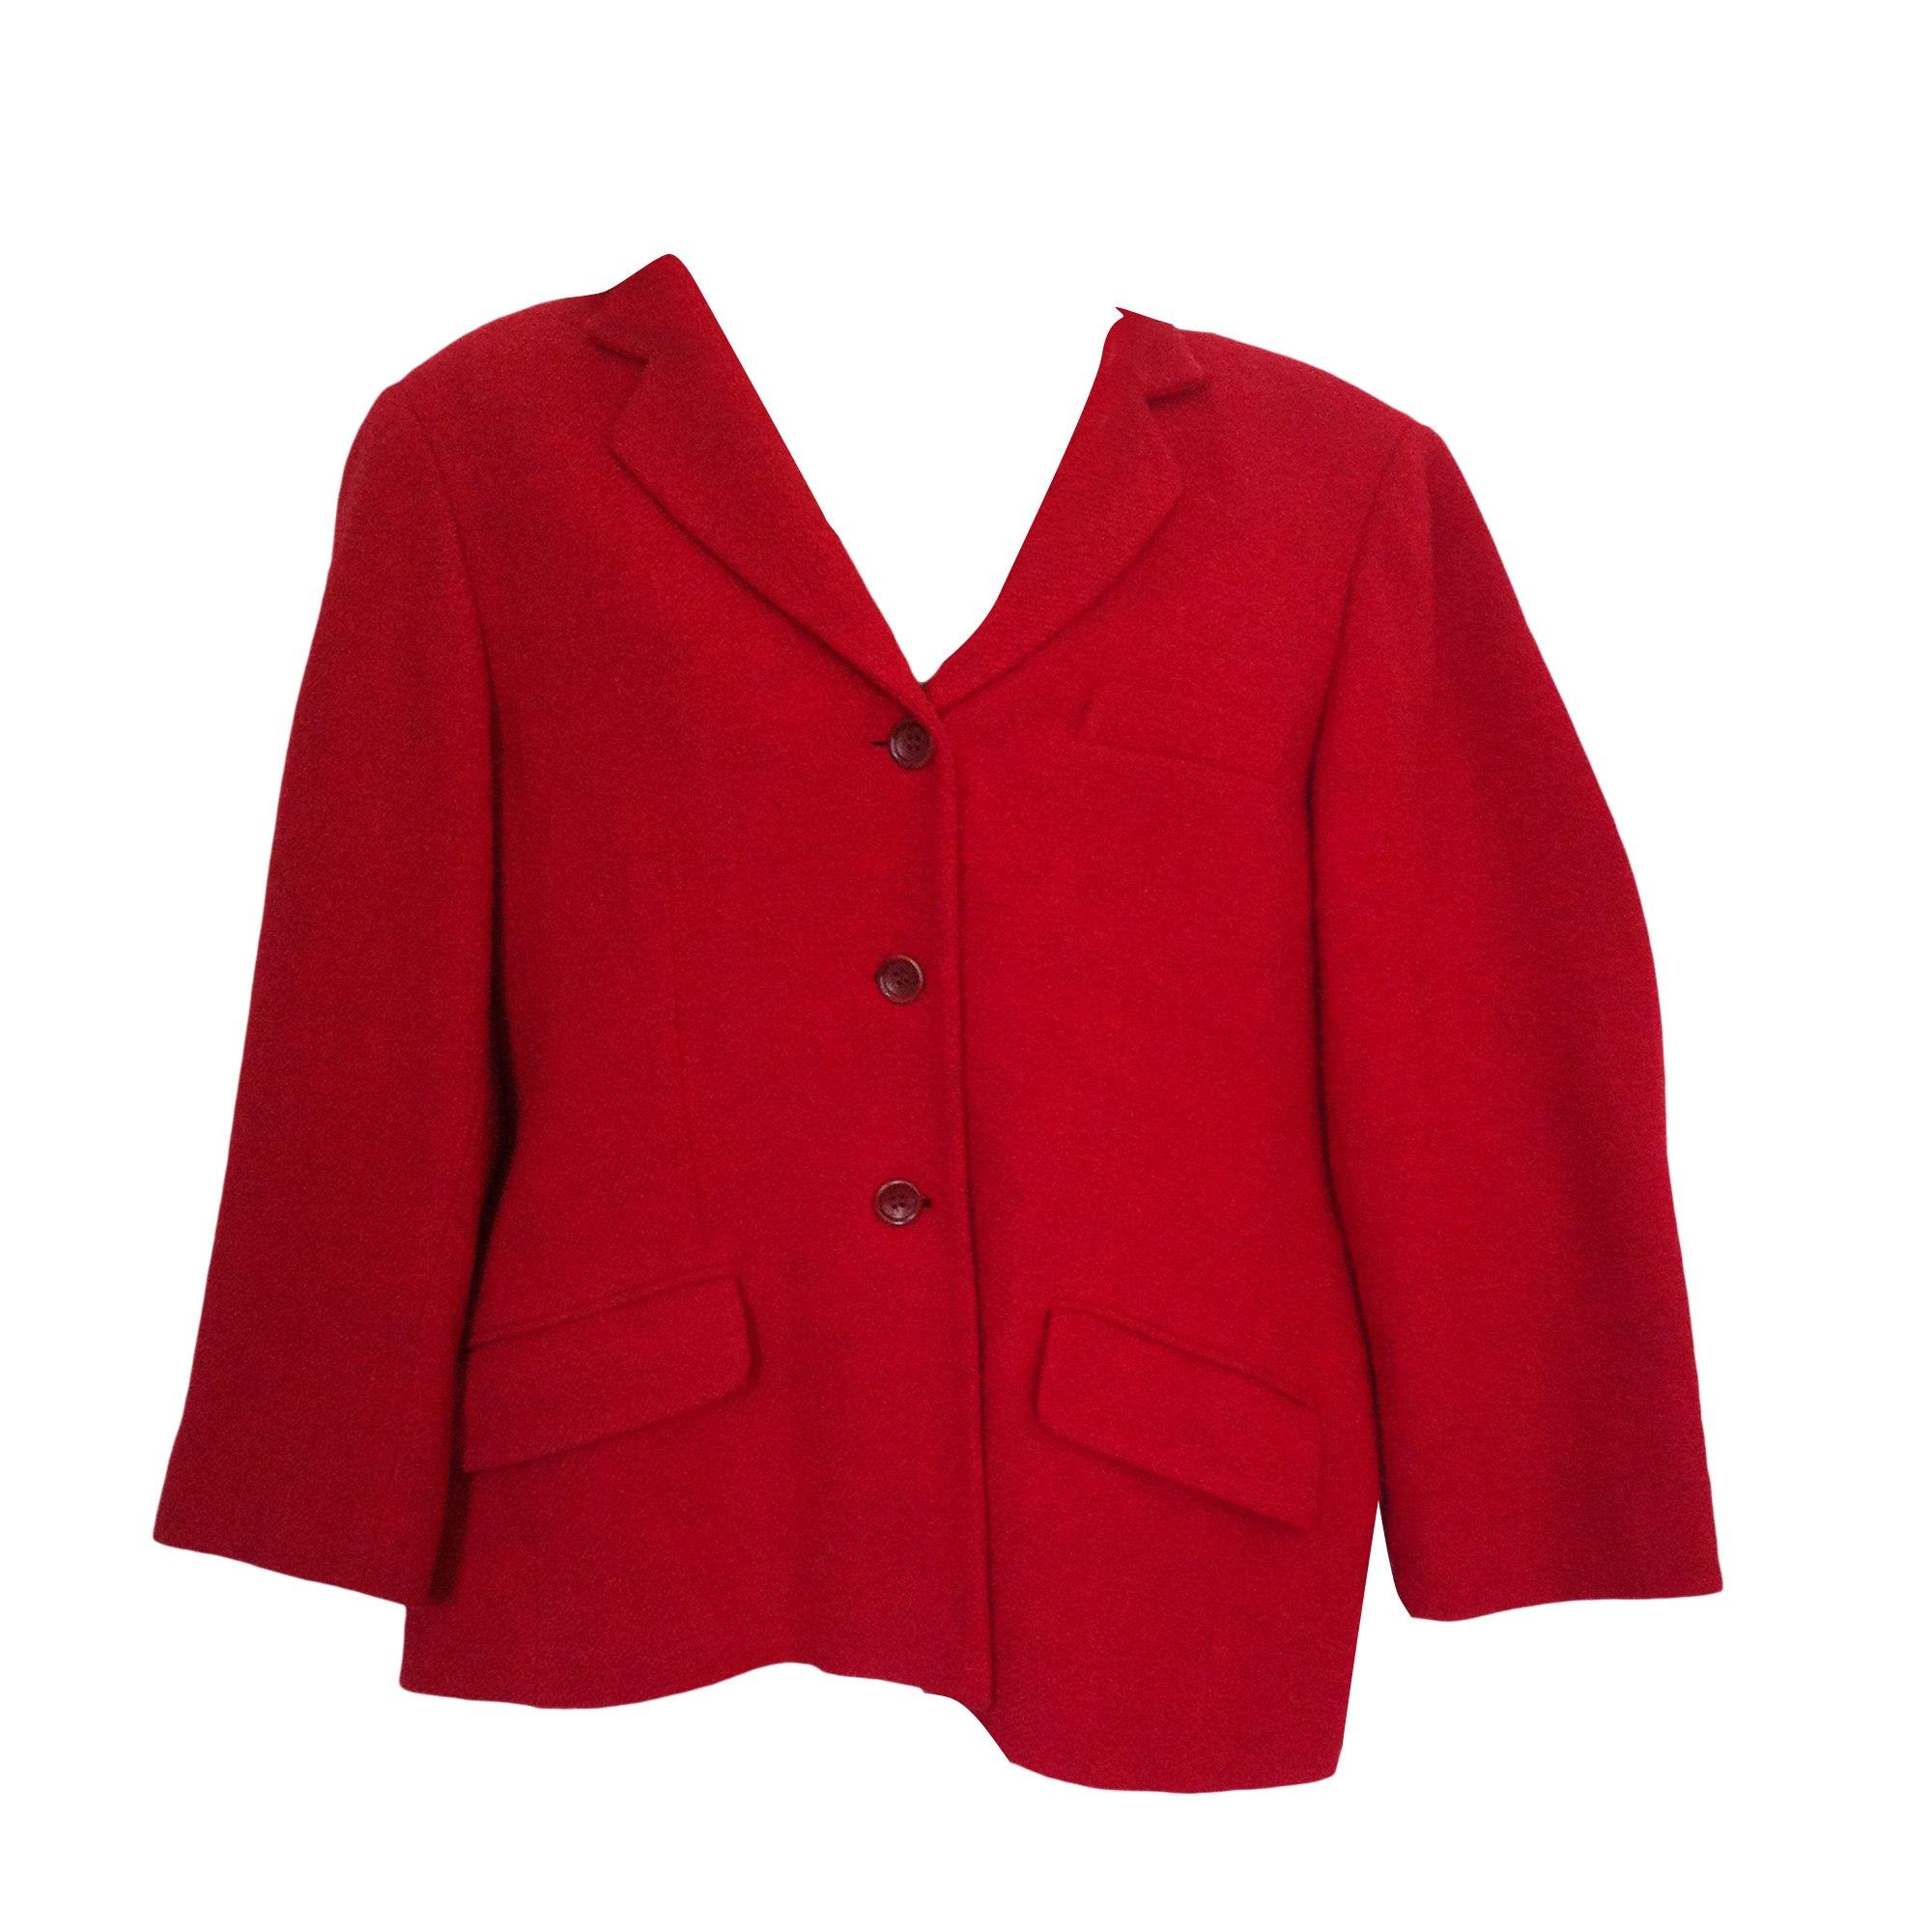 Blazer, veste tailleur GERARD DAREL Rouge, bordeaux